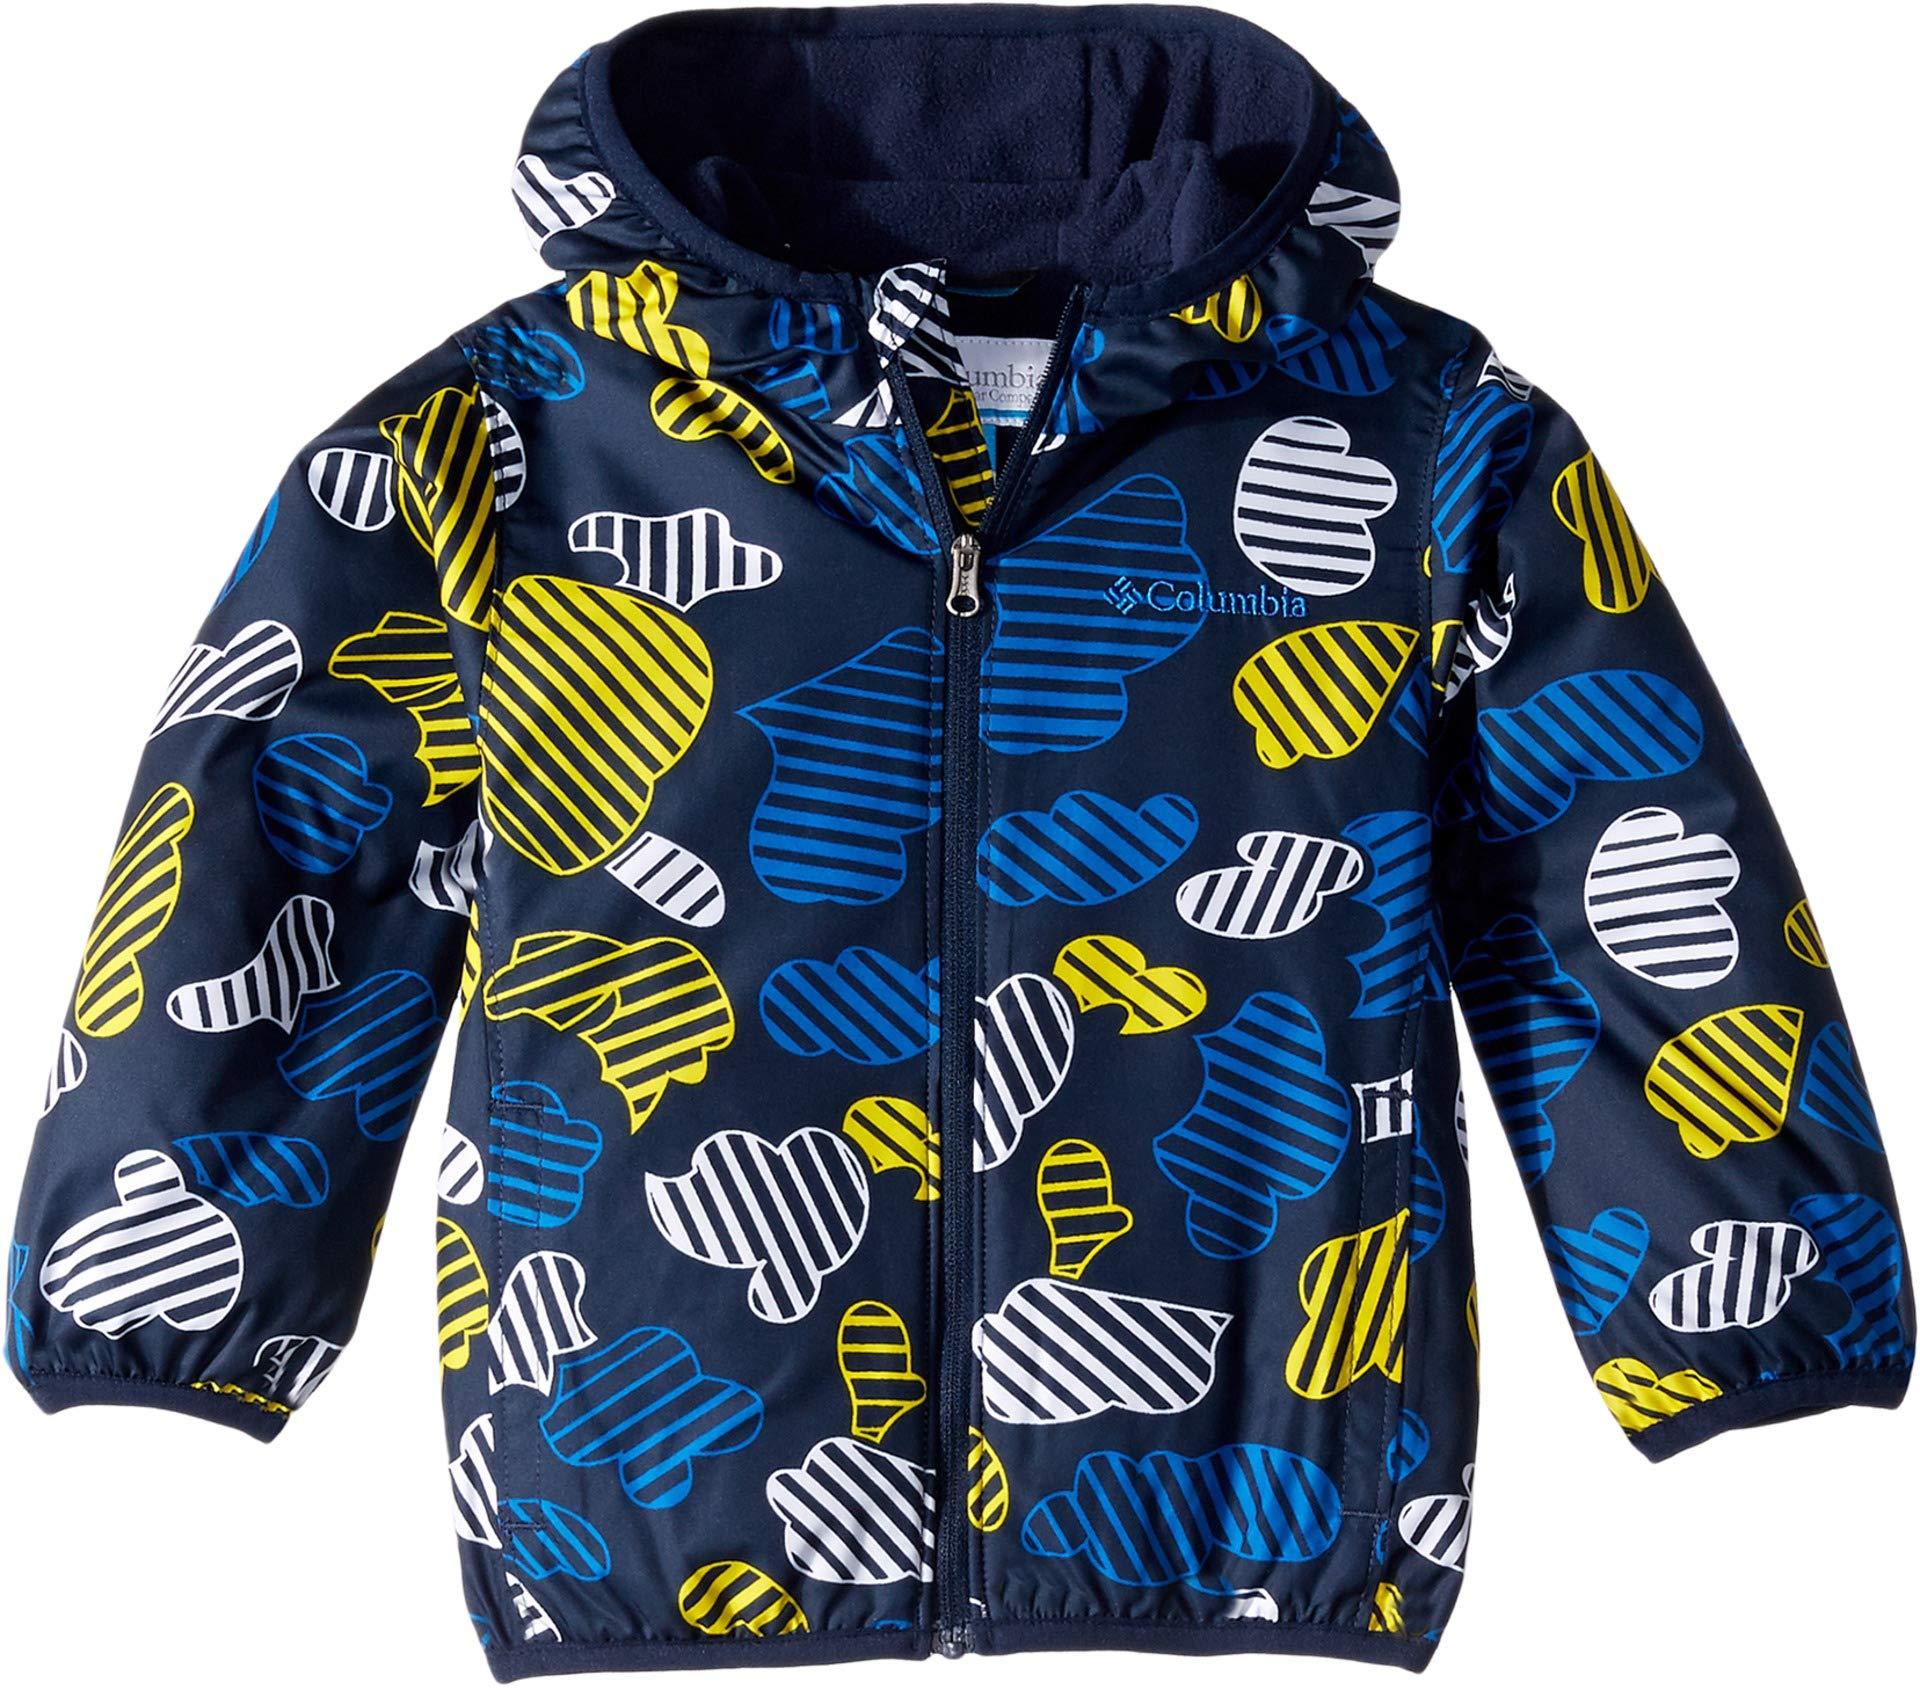 Columbia Kids Baby Boy's Mini Pixel Grabber¿ II Wind Jacket (Infant/Toddler) Collegiate Navy Cloudy Camo 12-18 Months